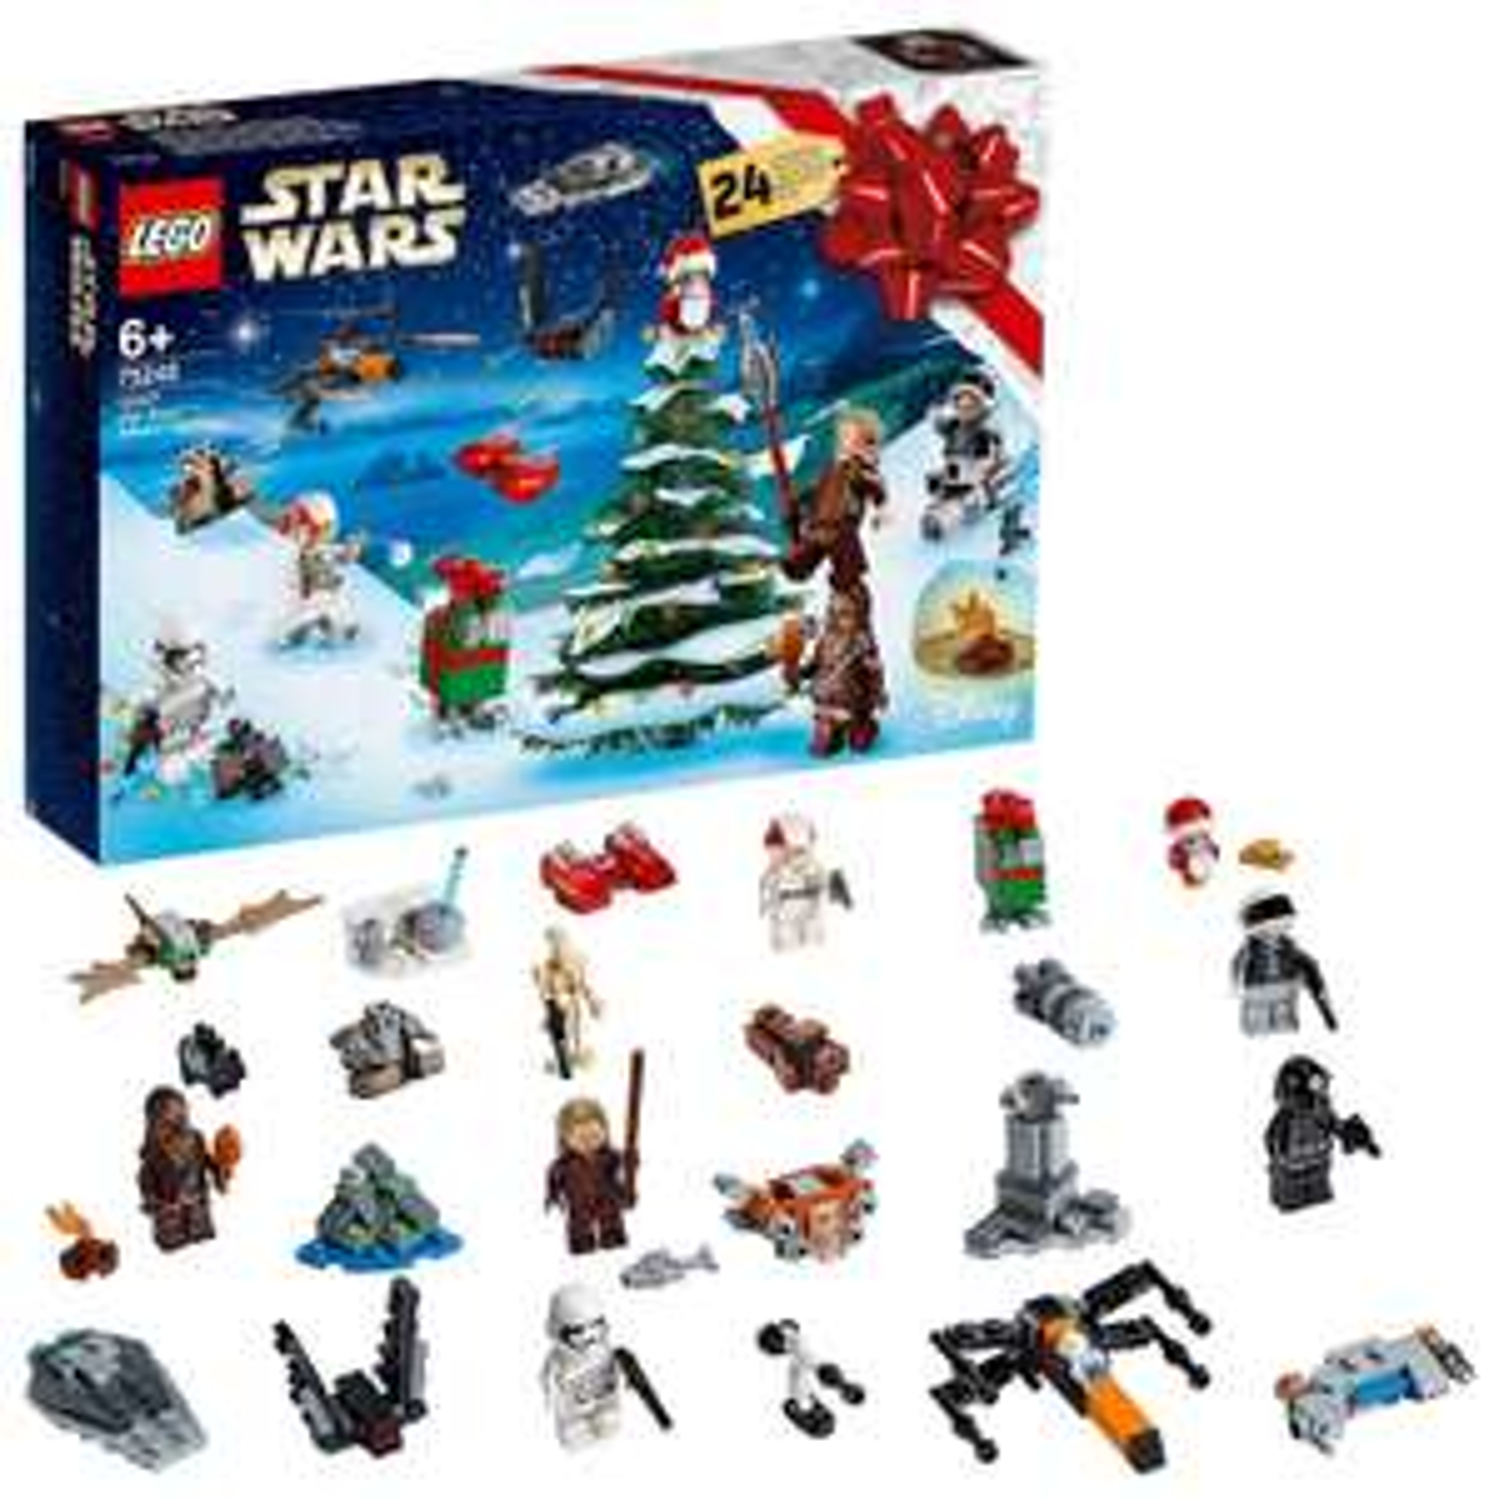 LEGO 75245 Star Wars Advent Calender £16 With Code @ Argos